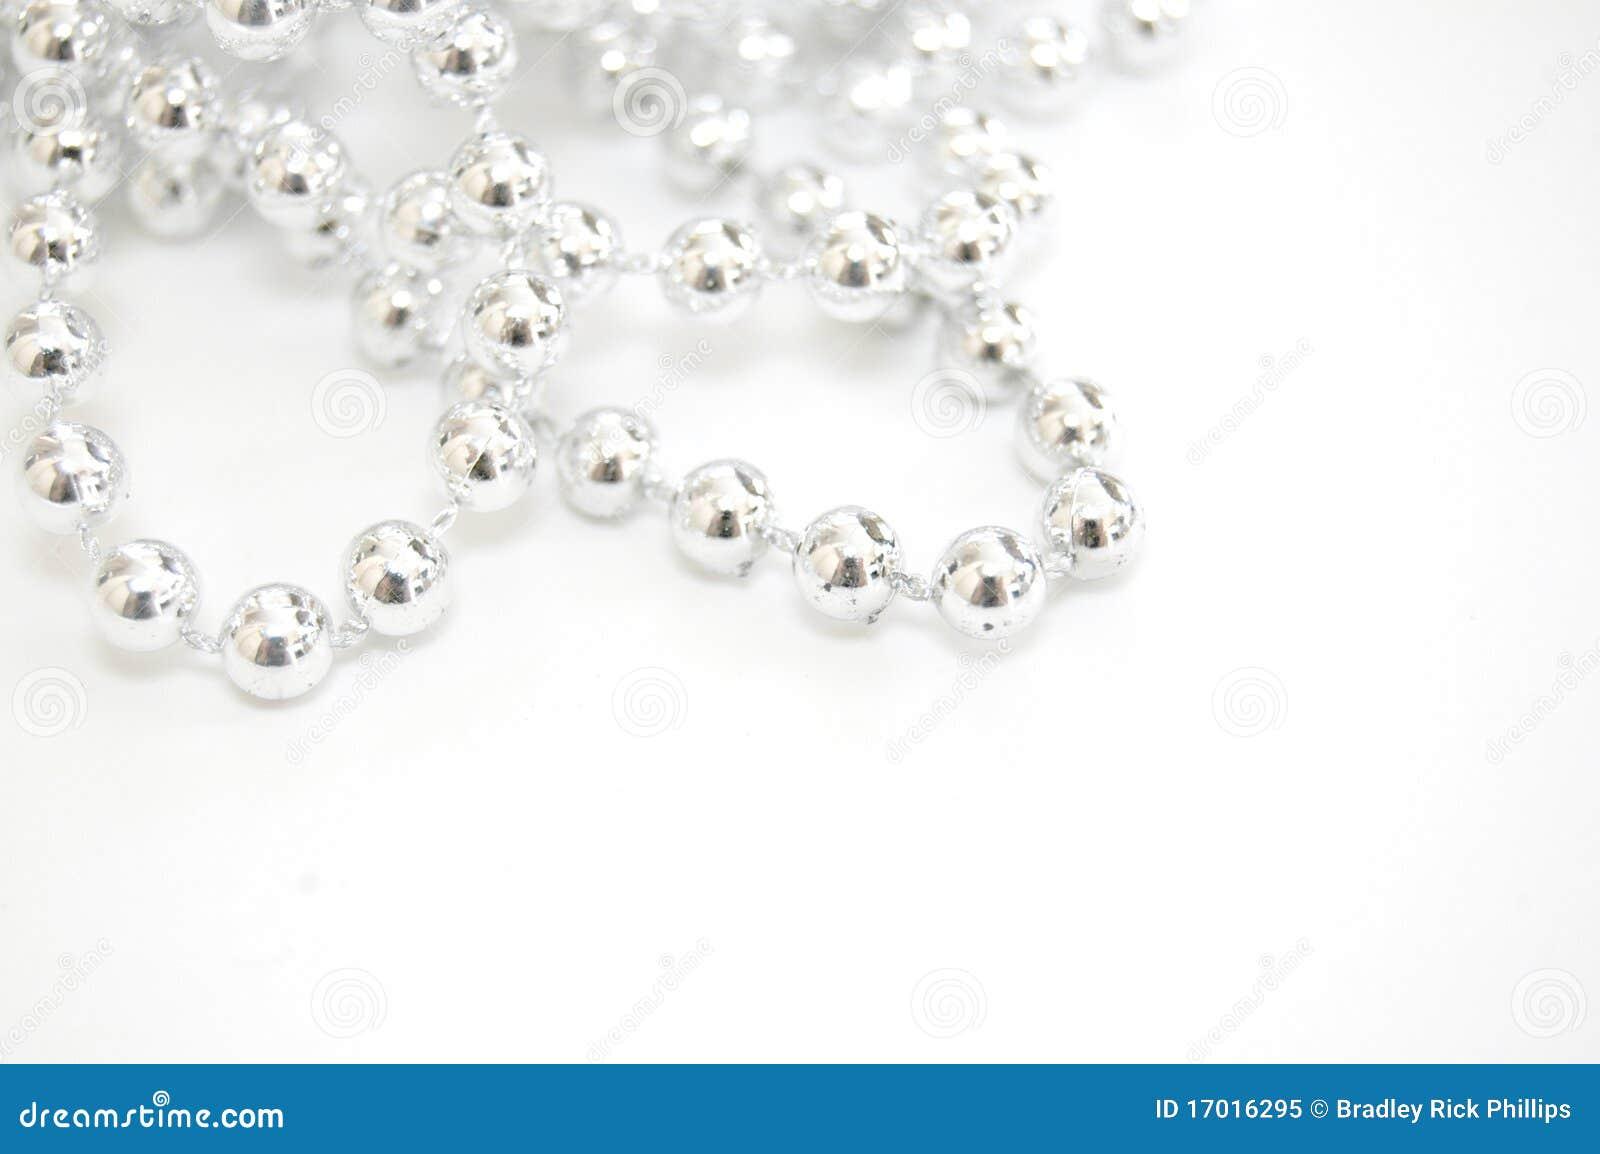 Jewelry Royalty Free Stock Photo - Image: 17016295